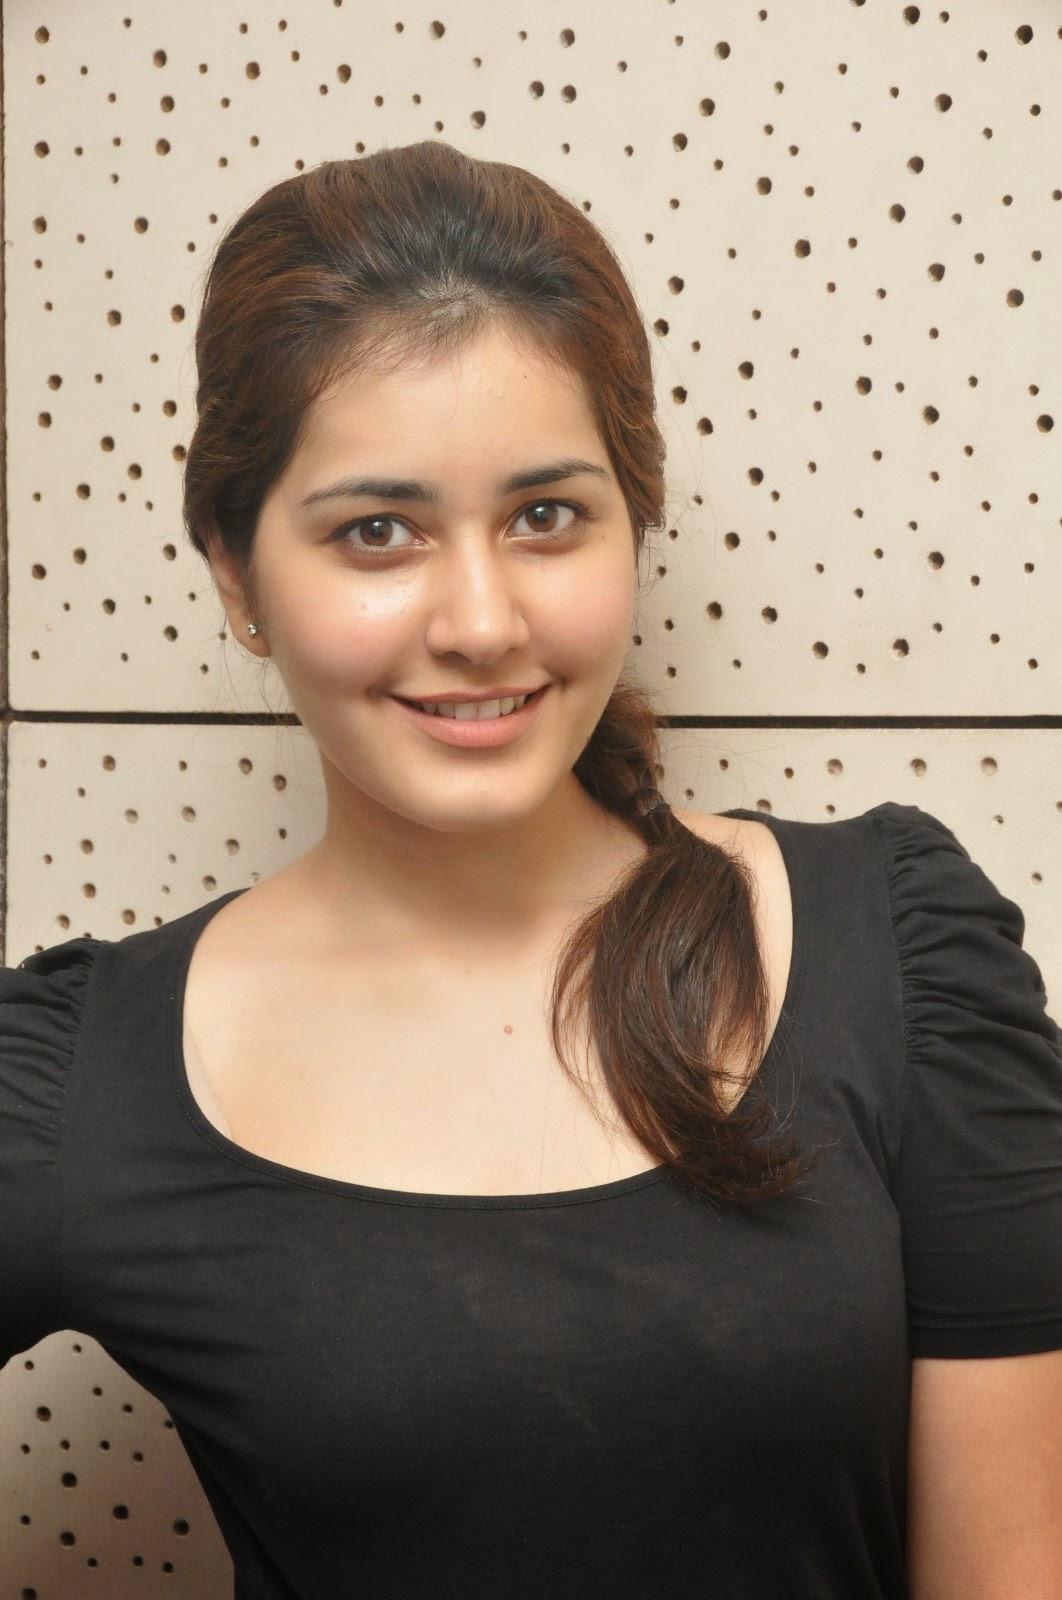 Attrice Rashi Khanna Hot Stills Galleria Hot And Cute-9765